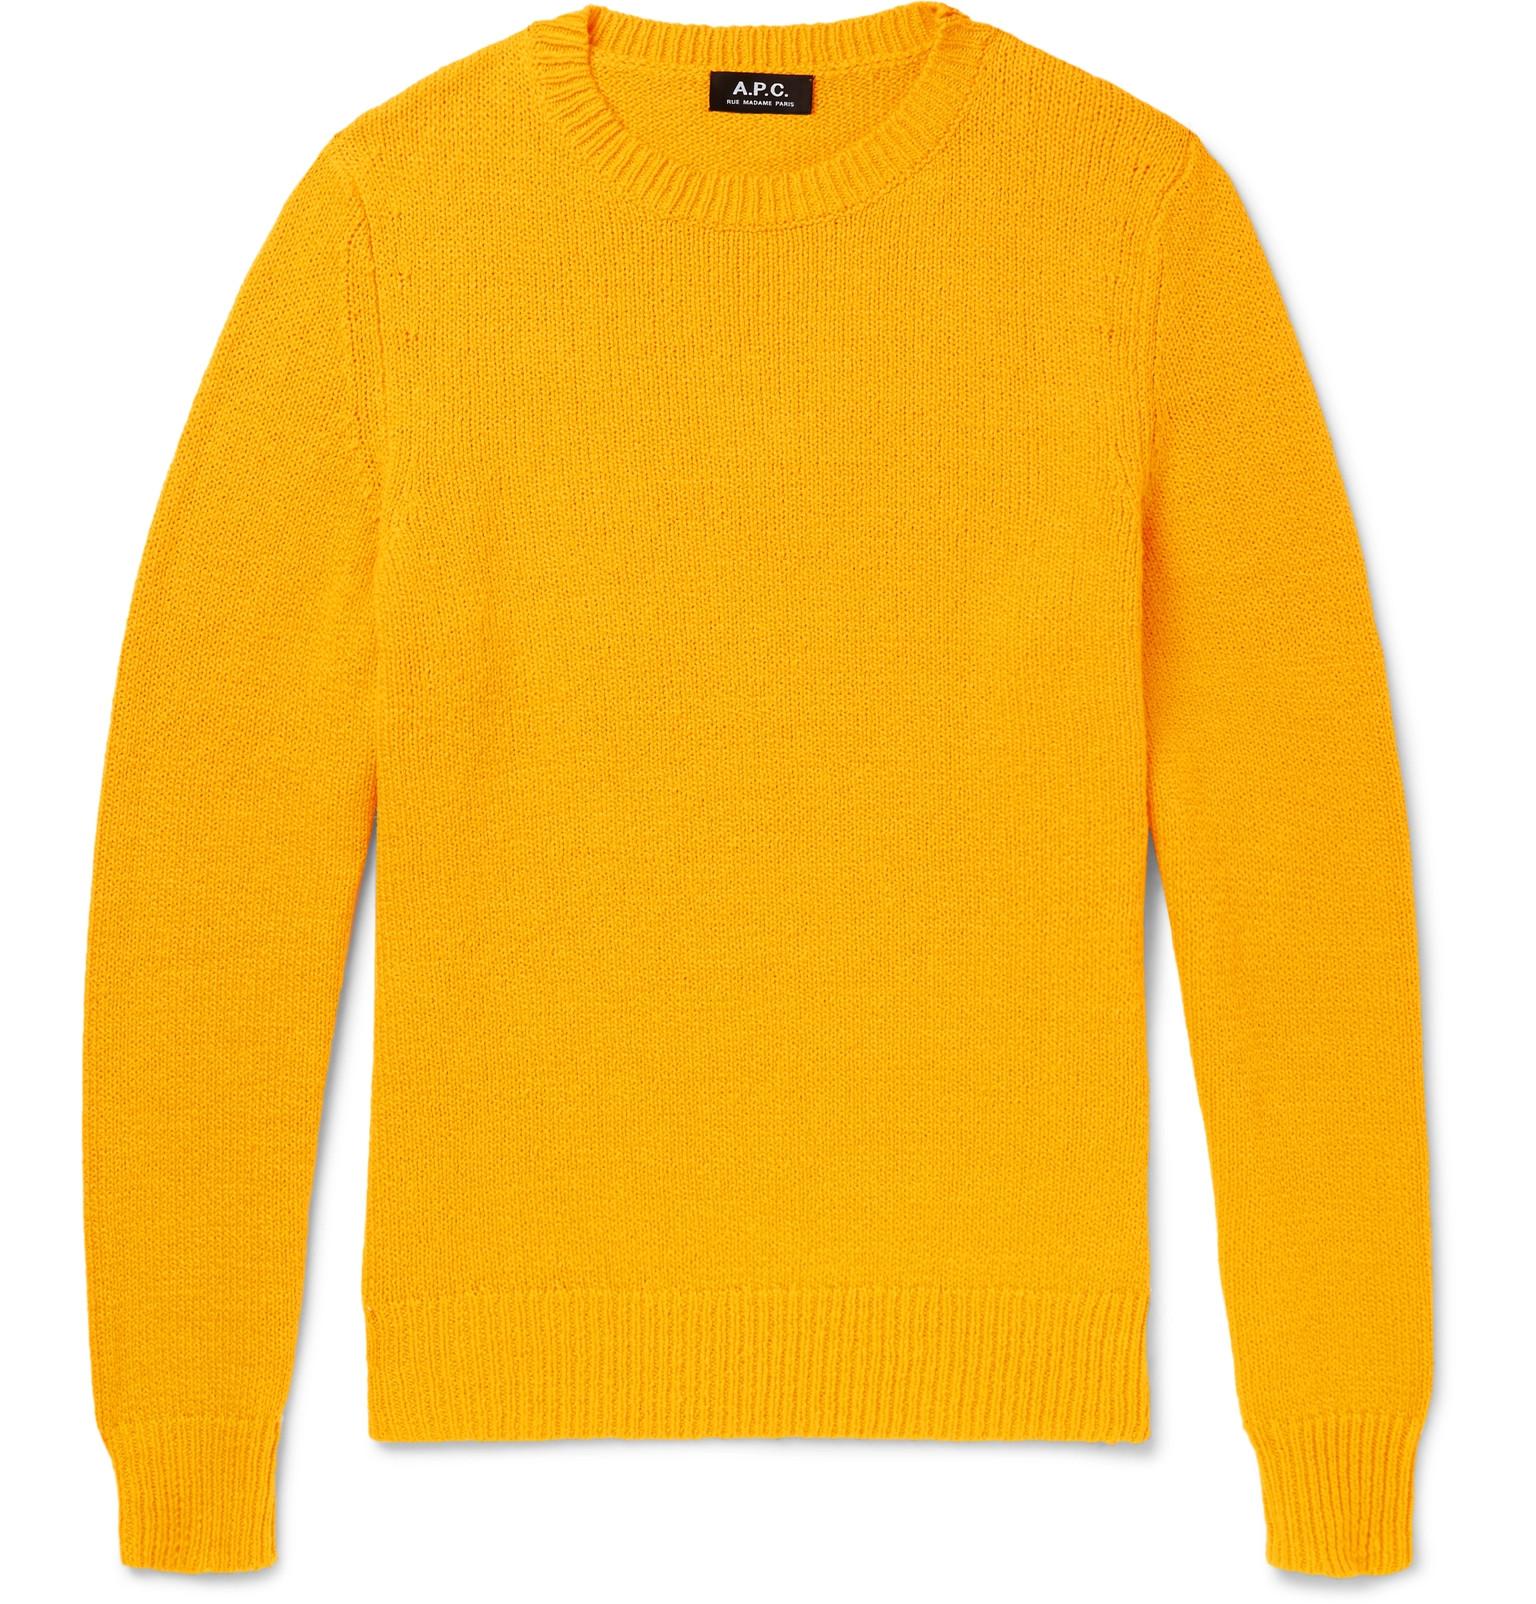 A.P.C. - Pull Lagoon Cotton Sweater